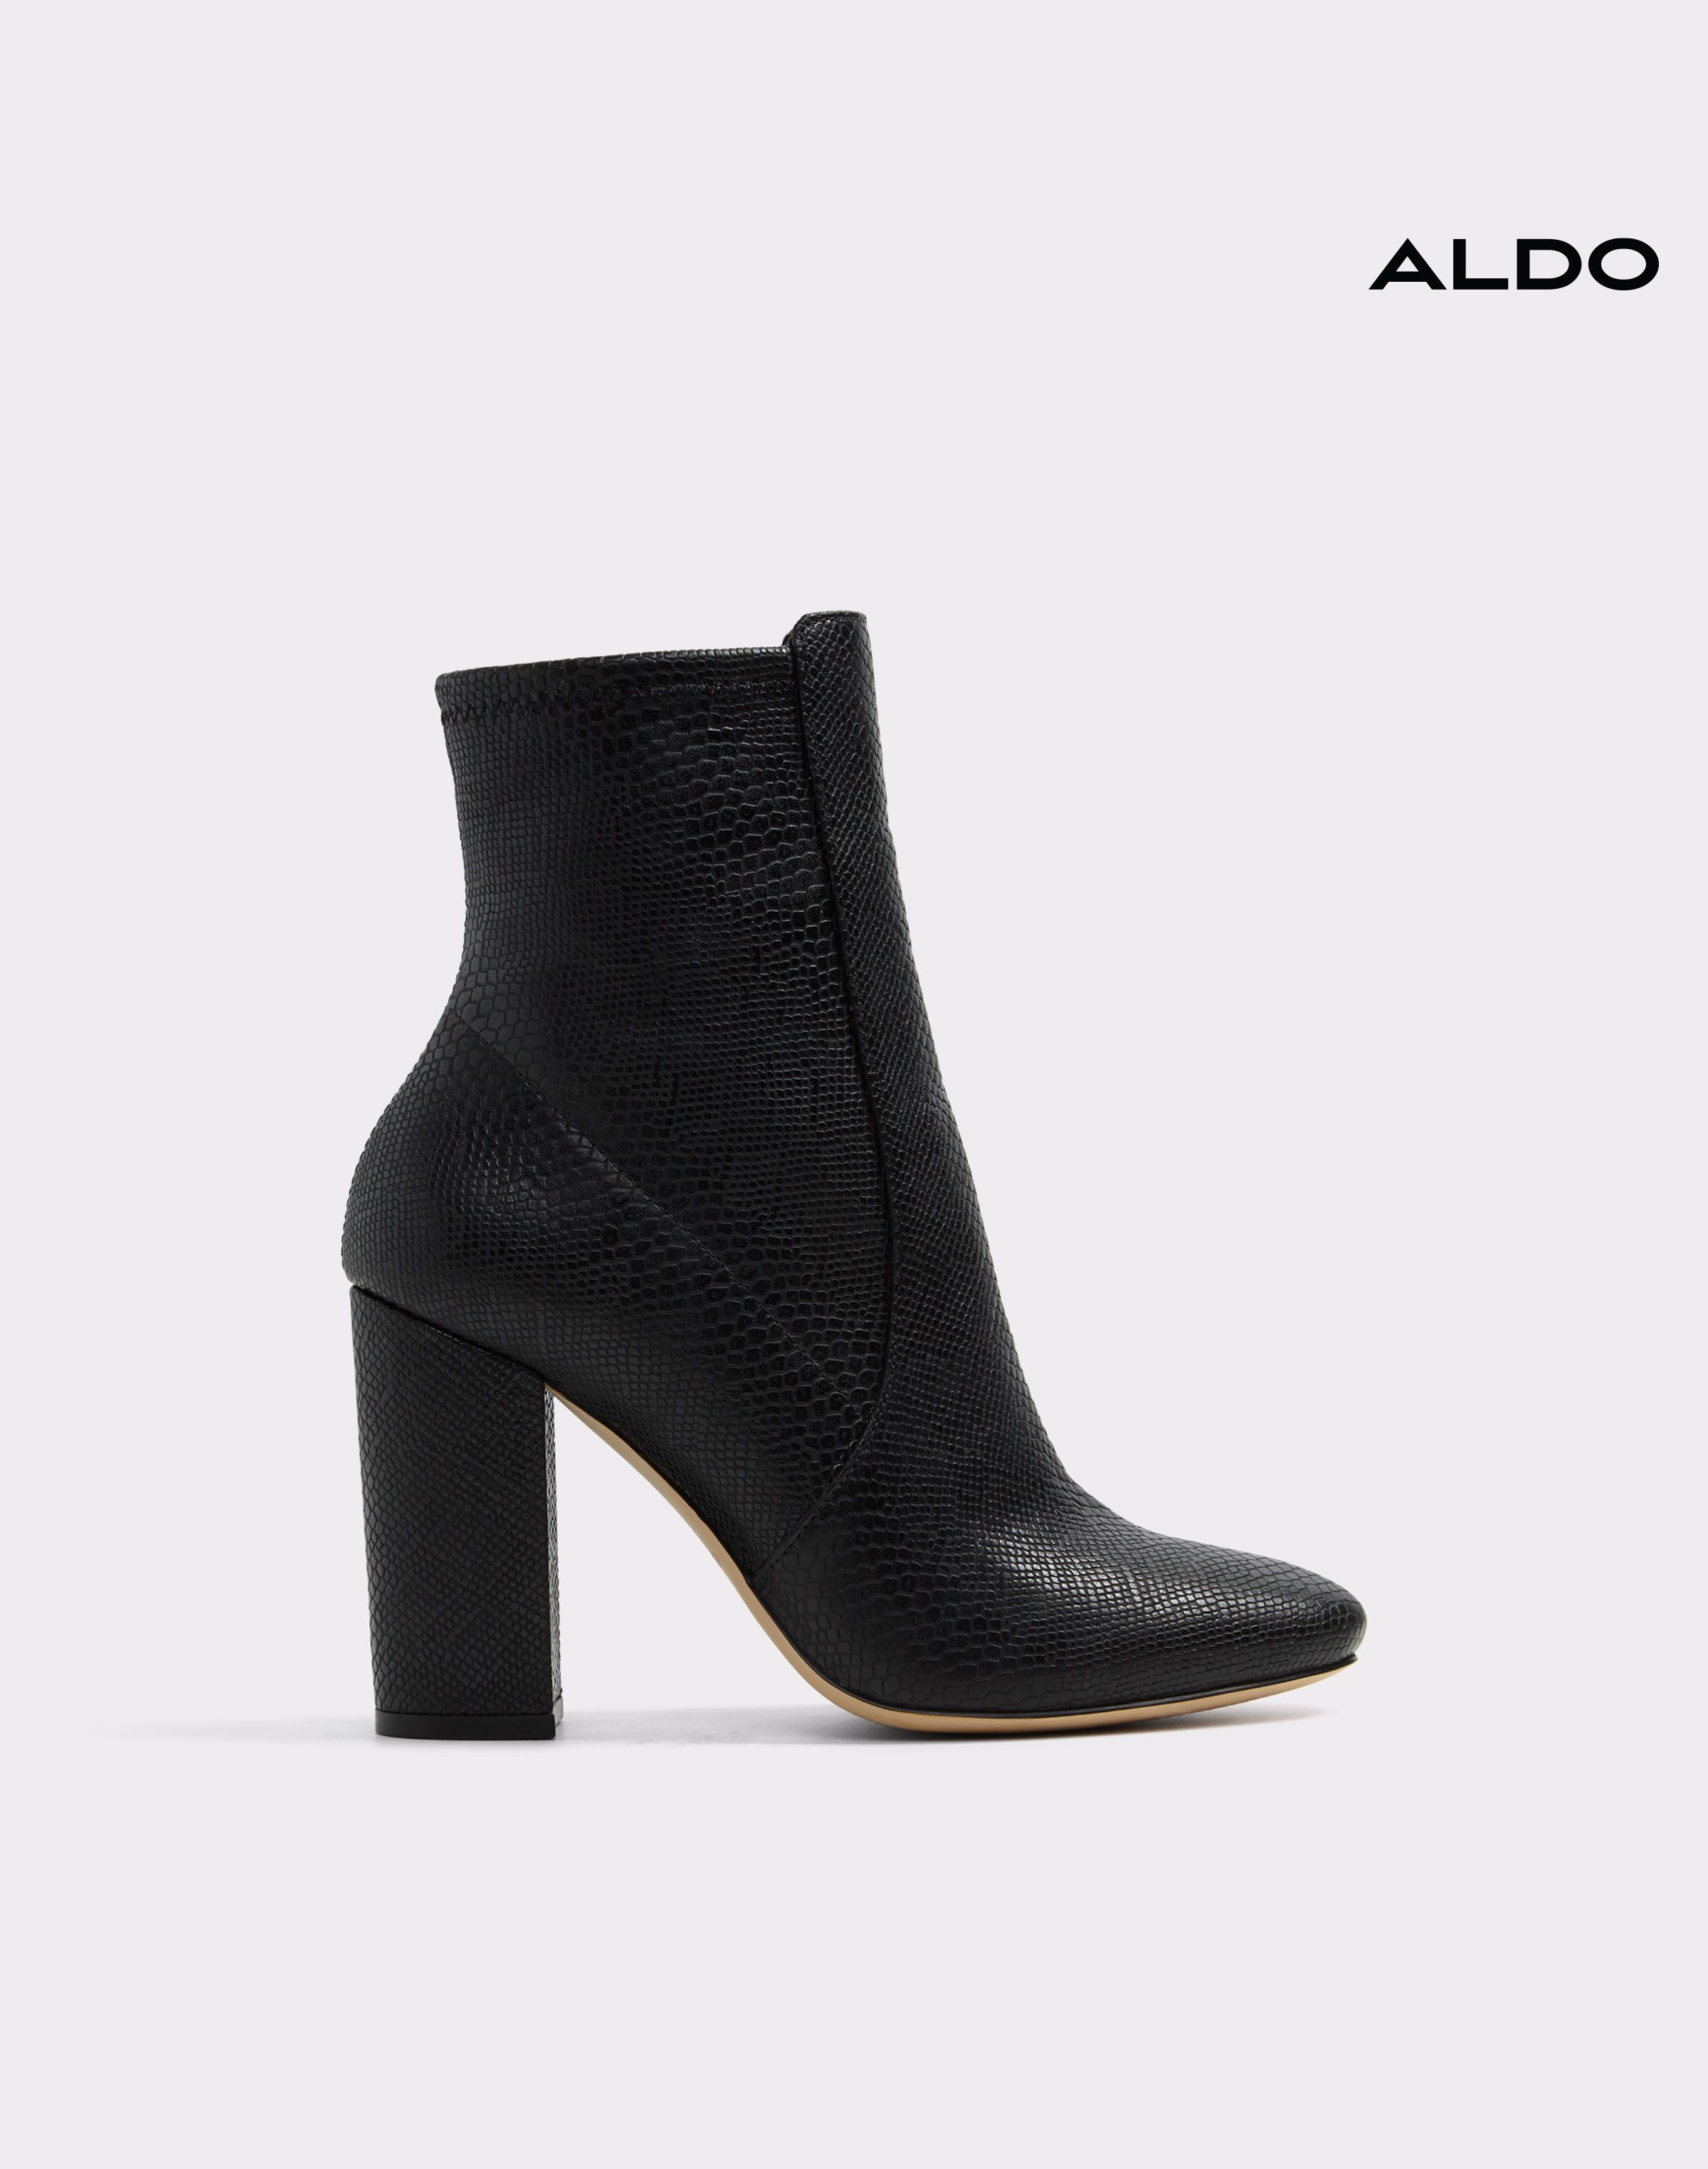 333570f87b74 Aurella Black Misc. Women s Ankle boots